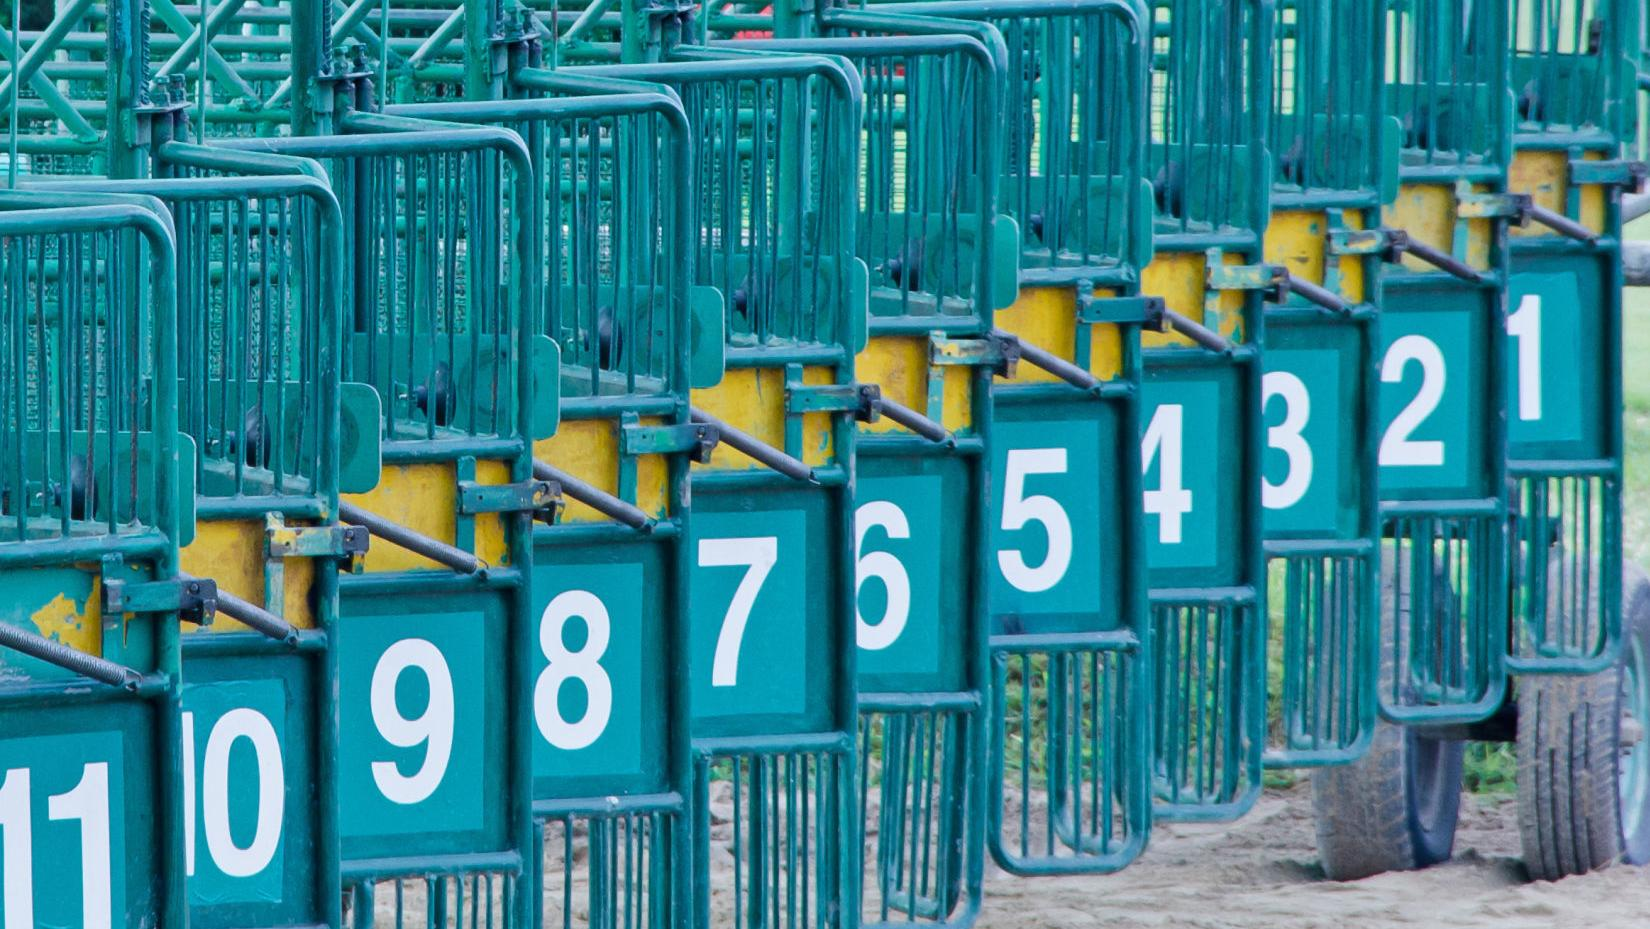 tucson off track betting